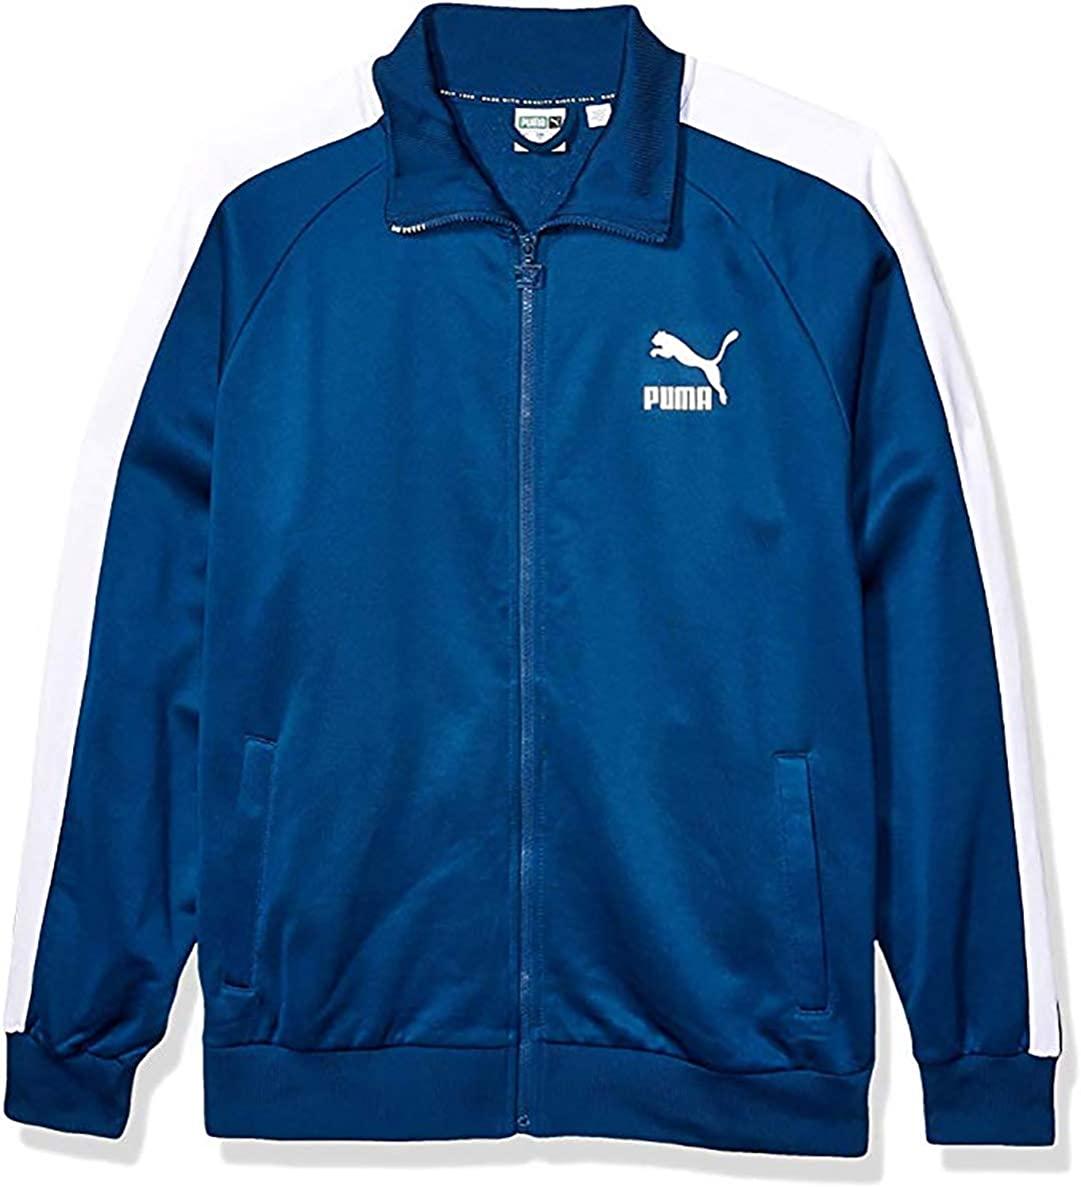 PUMA Men's Iconic T7 Track Jackets Fashion Sports Track Top